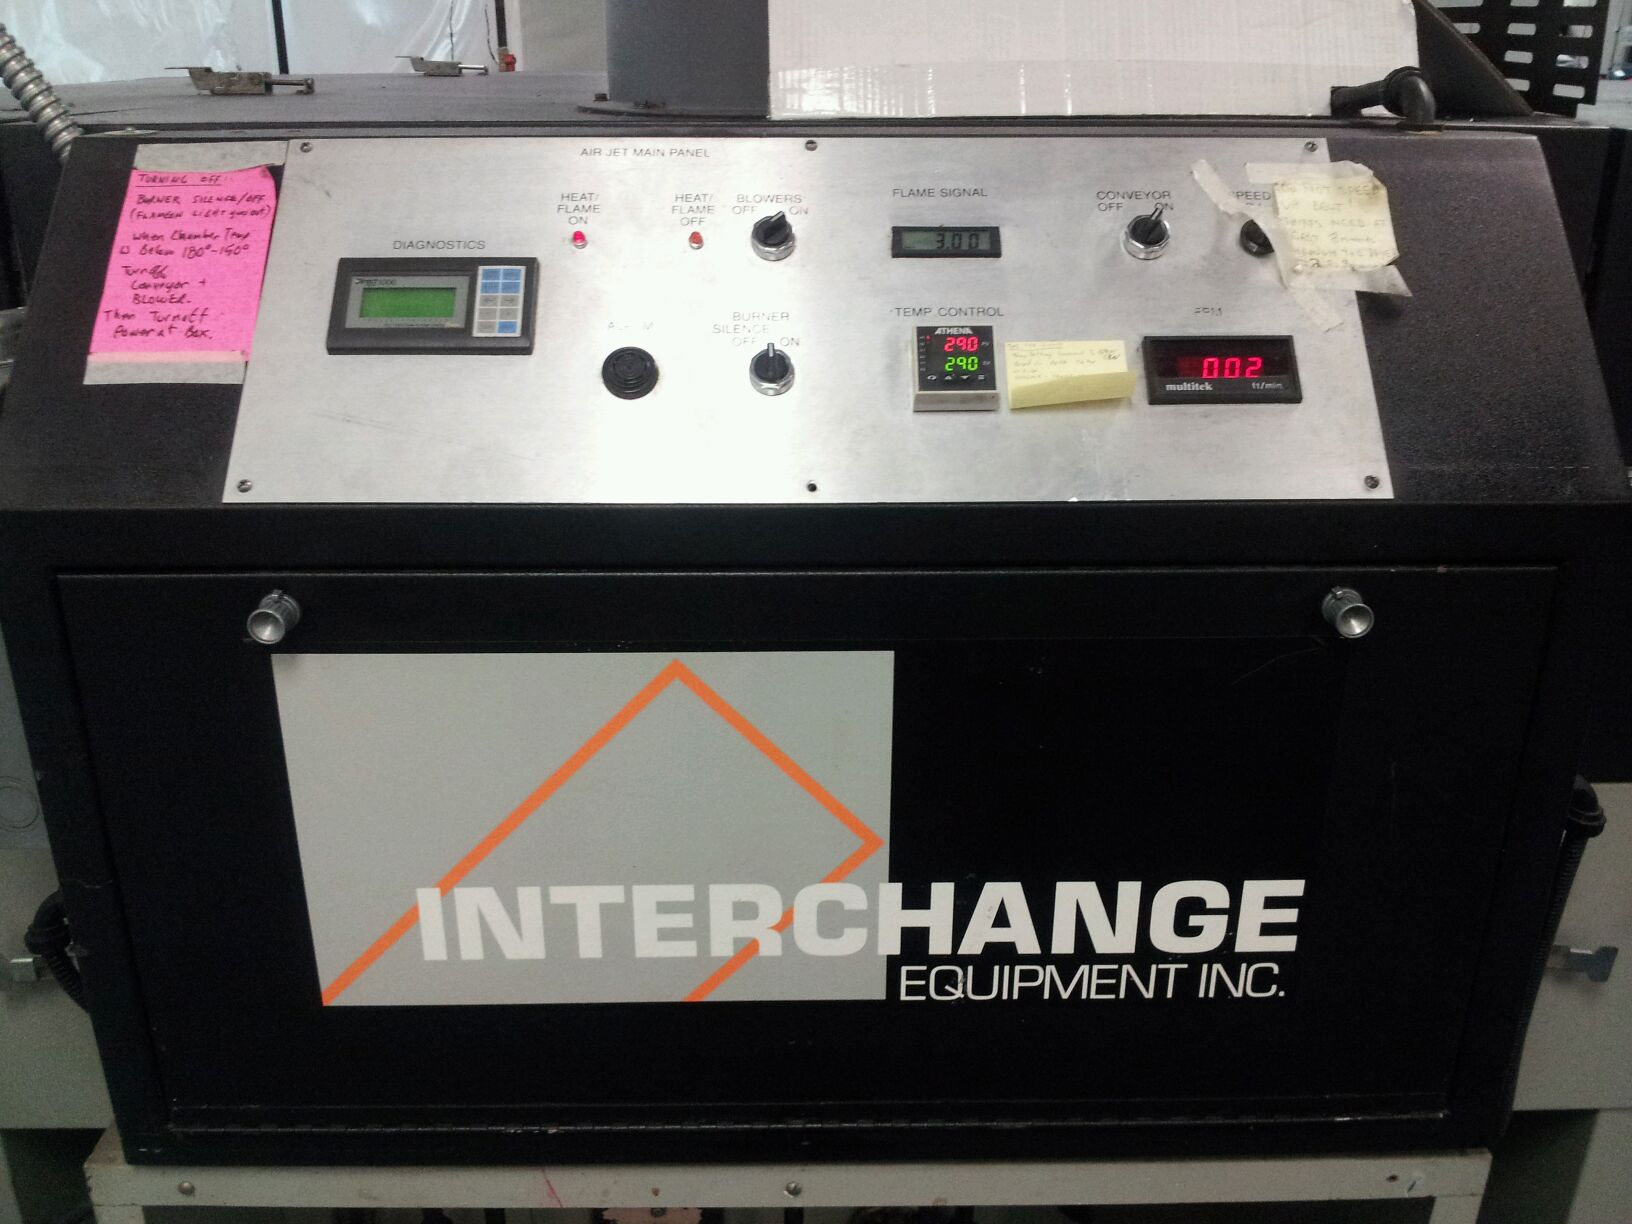 2 interchange dryers for